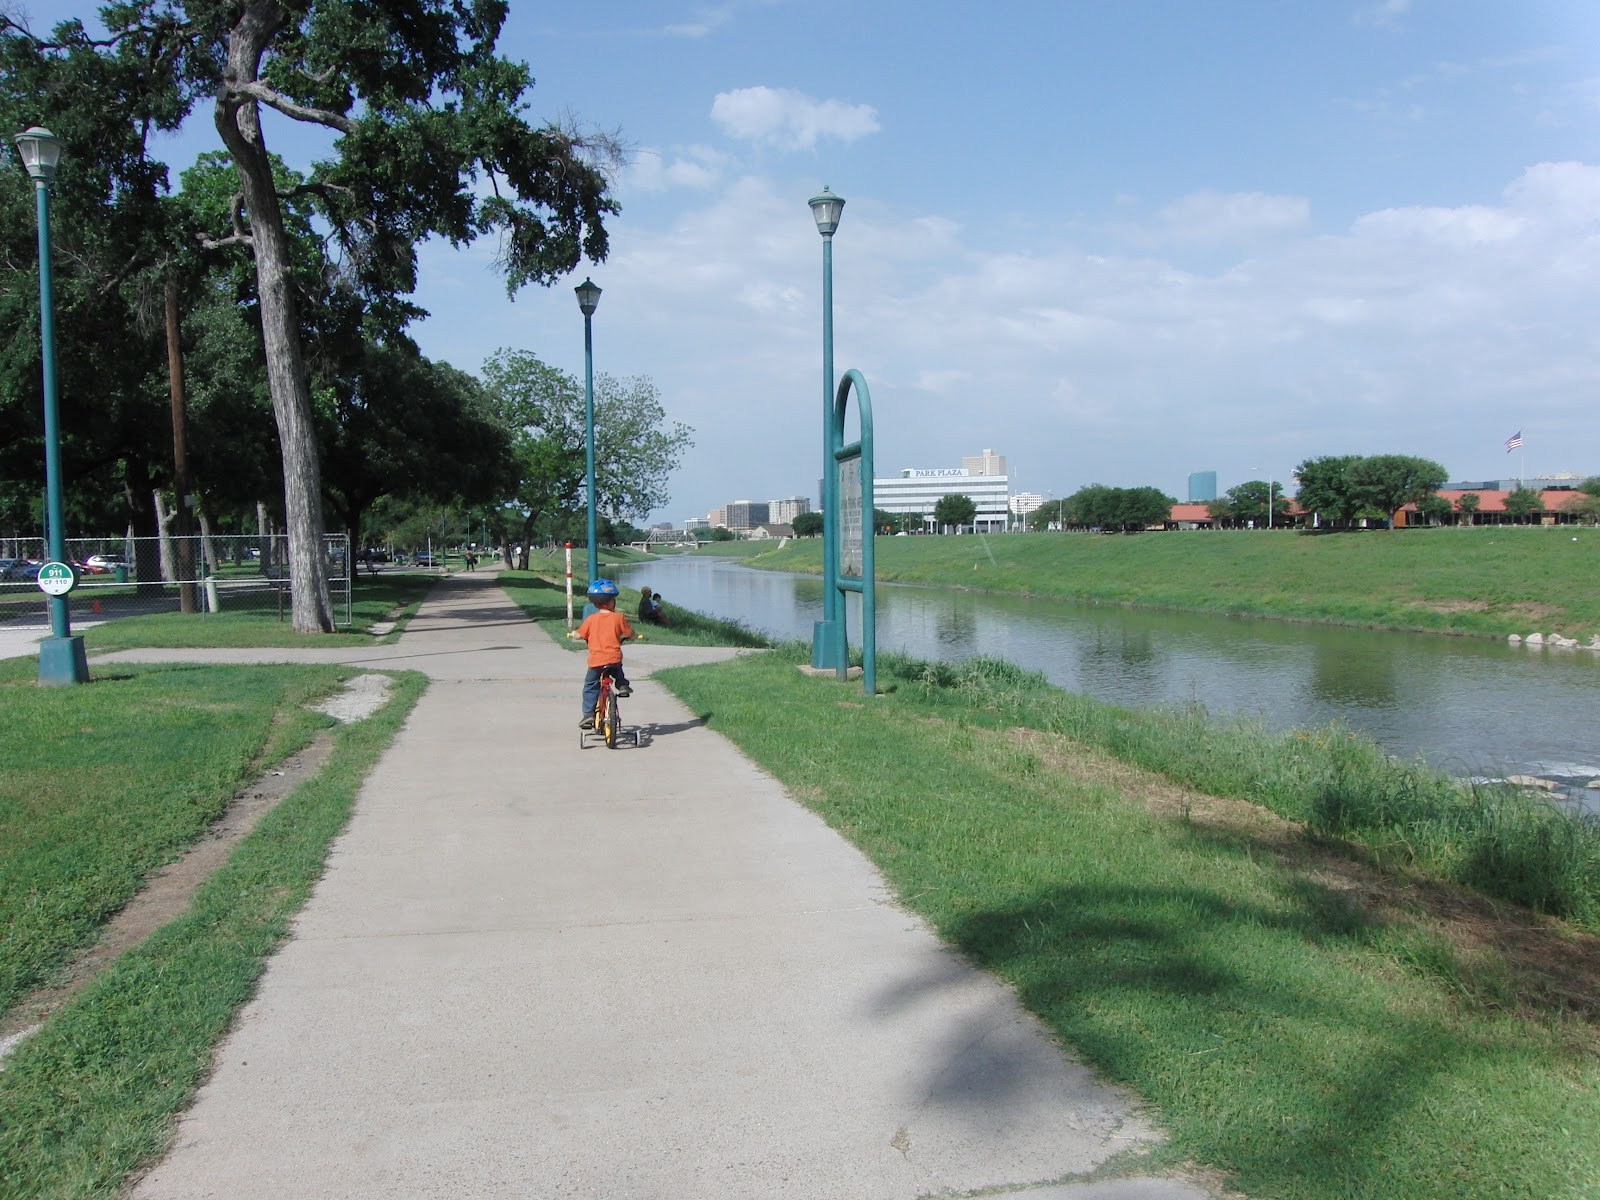 Trinity Trail Fort Worth Having Fun In The Texas Sun